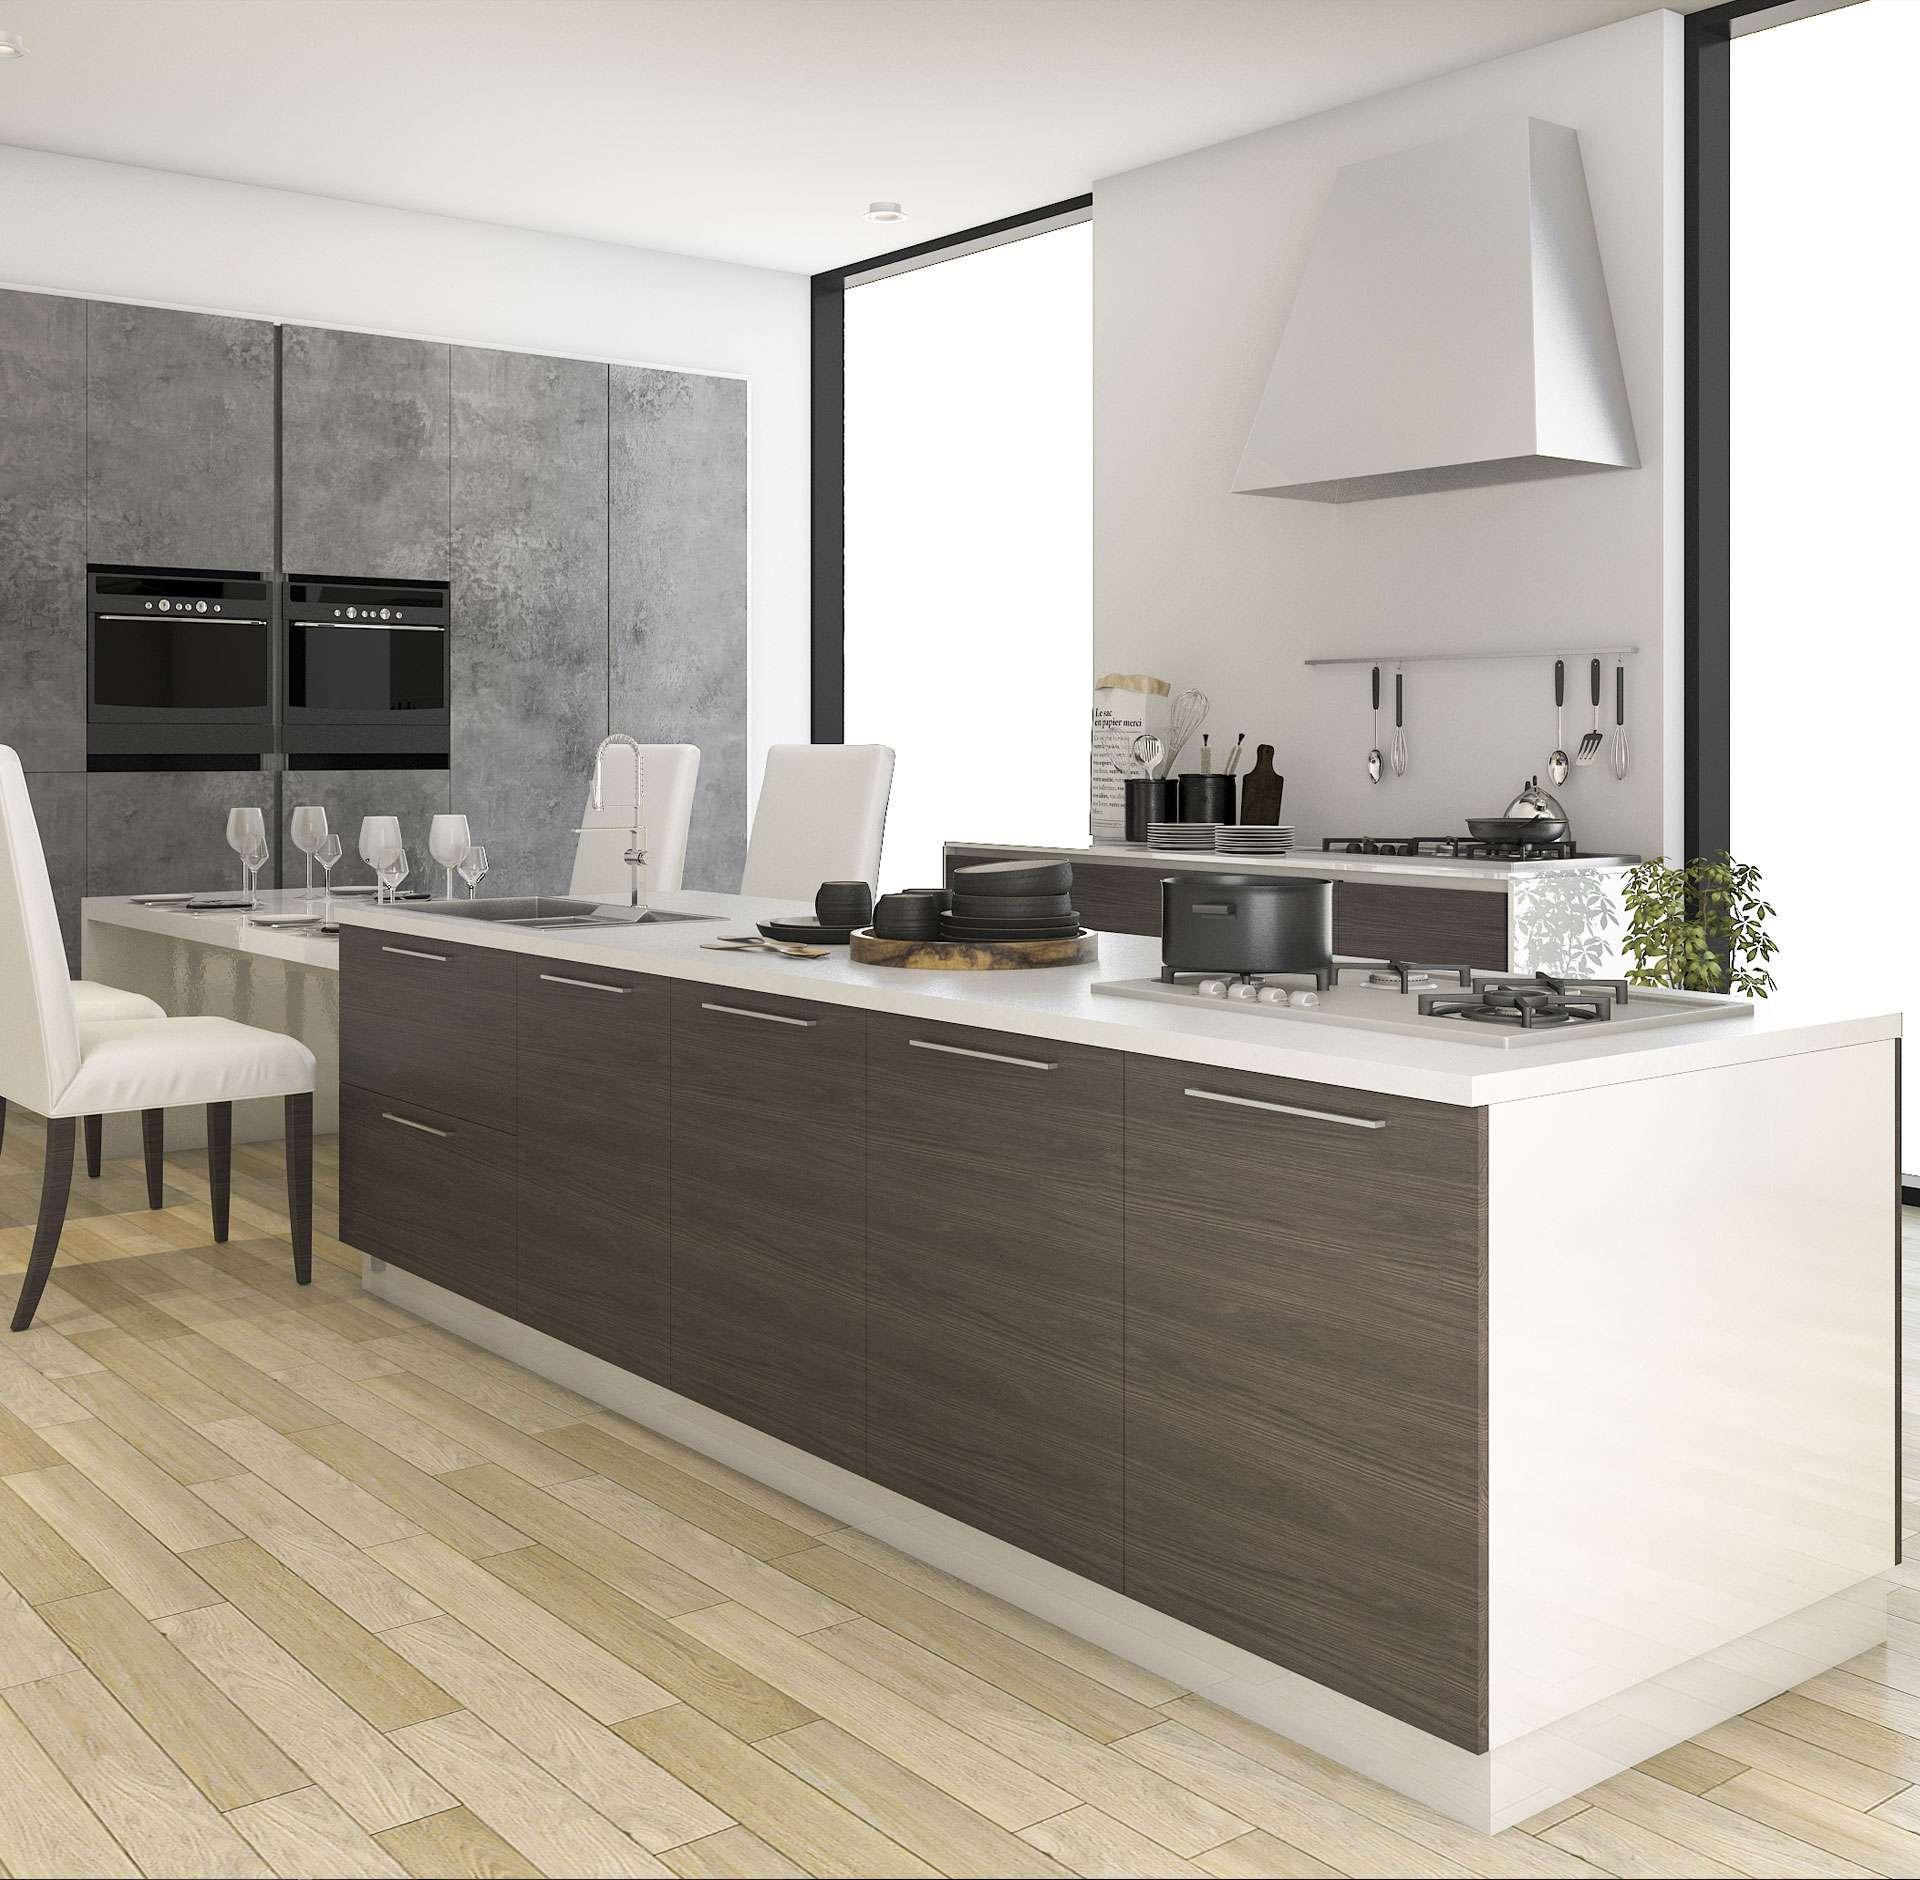 Elegant German kitchen integrates sitting area for your family